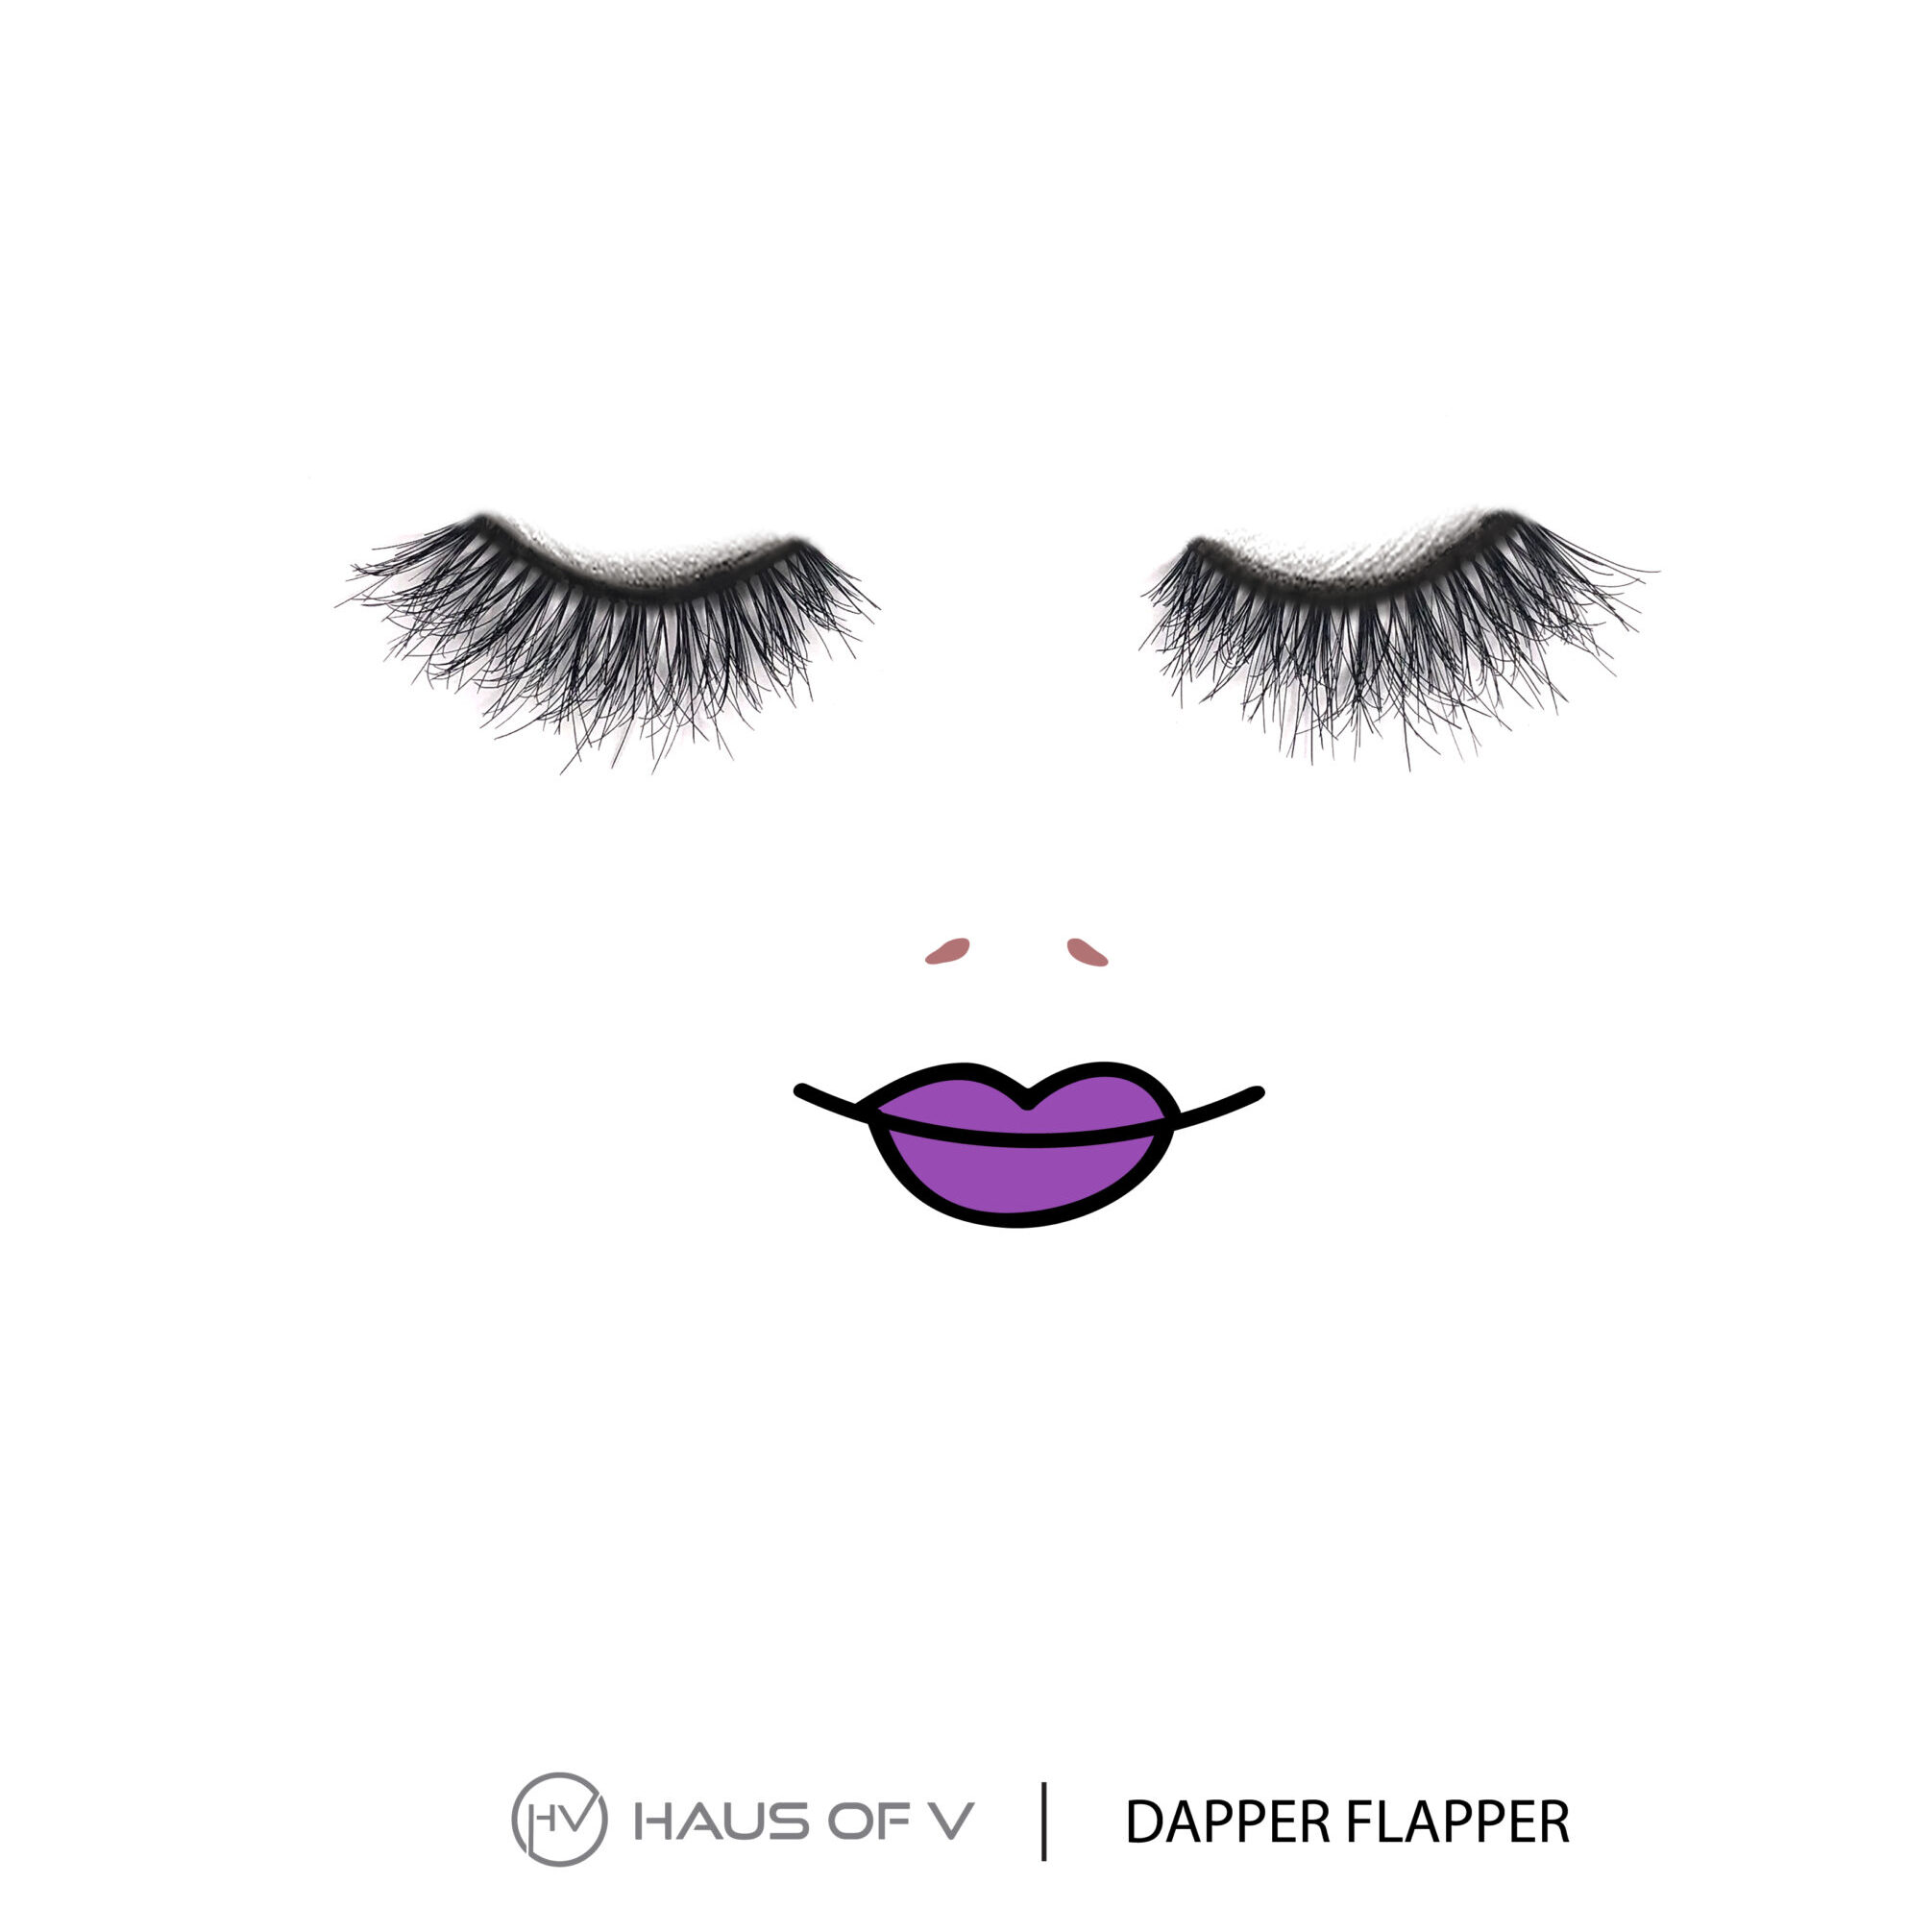 Dapper Flapper